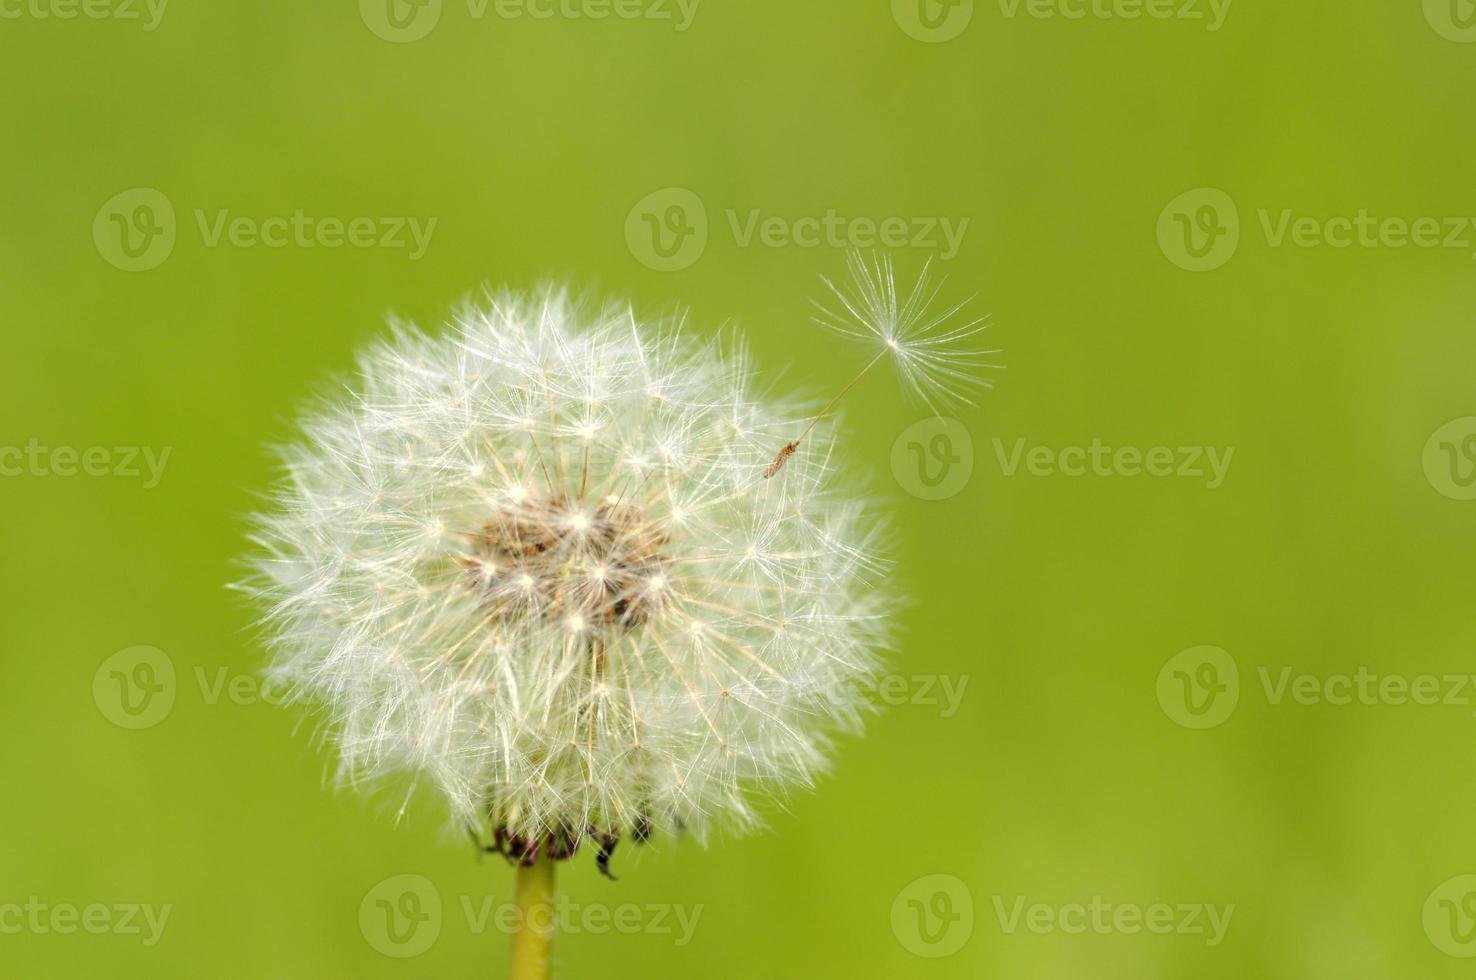 Cotton wool of the dandelion photo